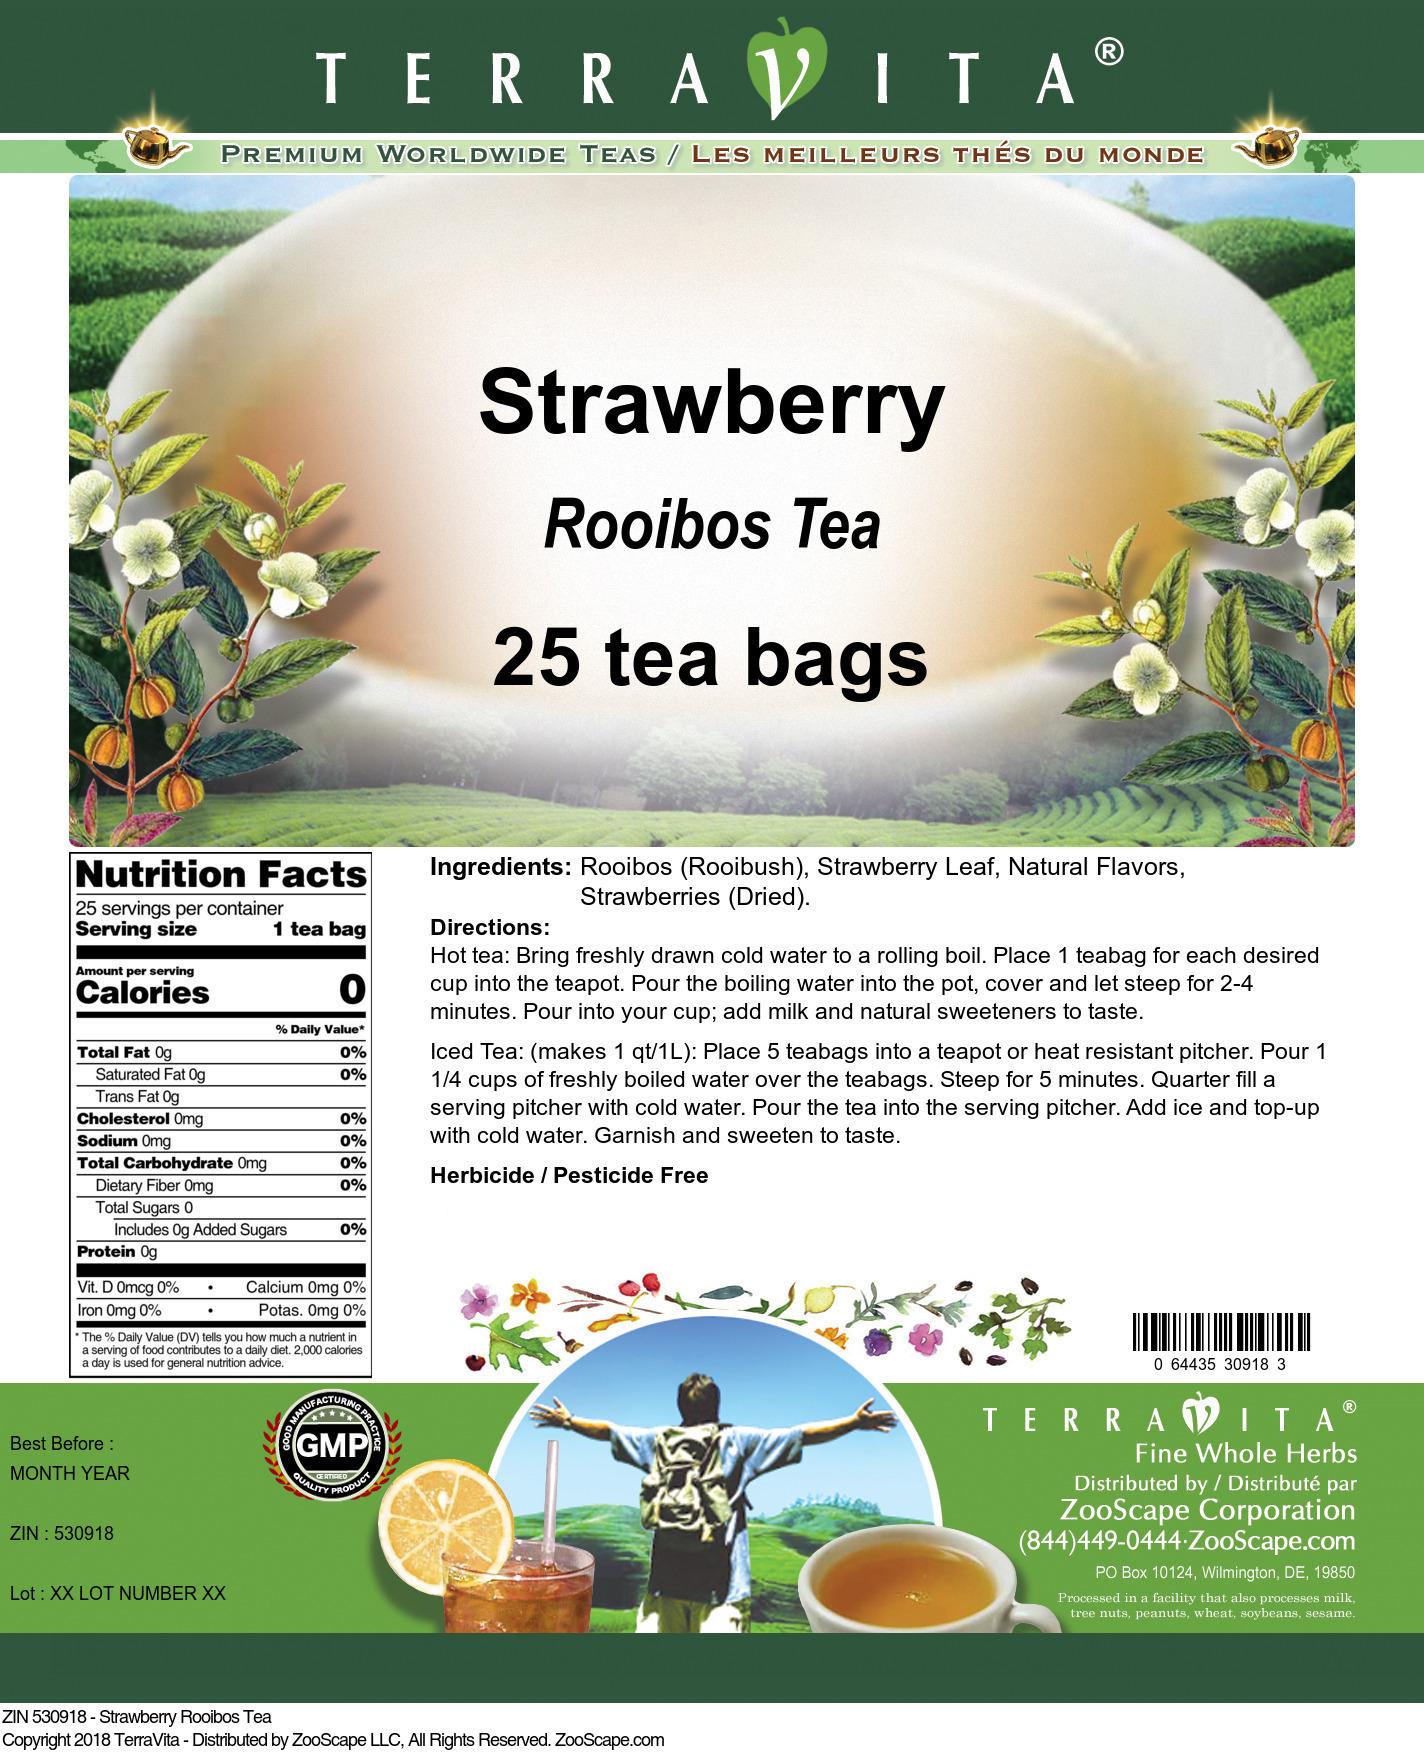 Strawberry Rooibos Tea